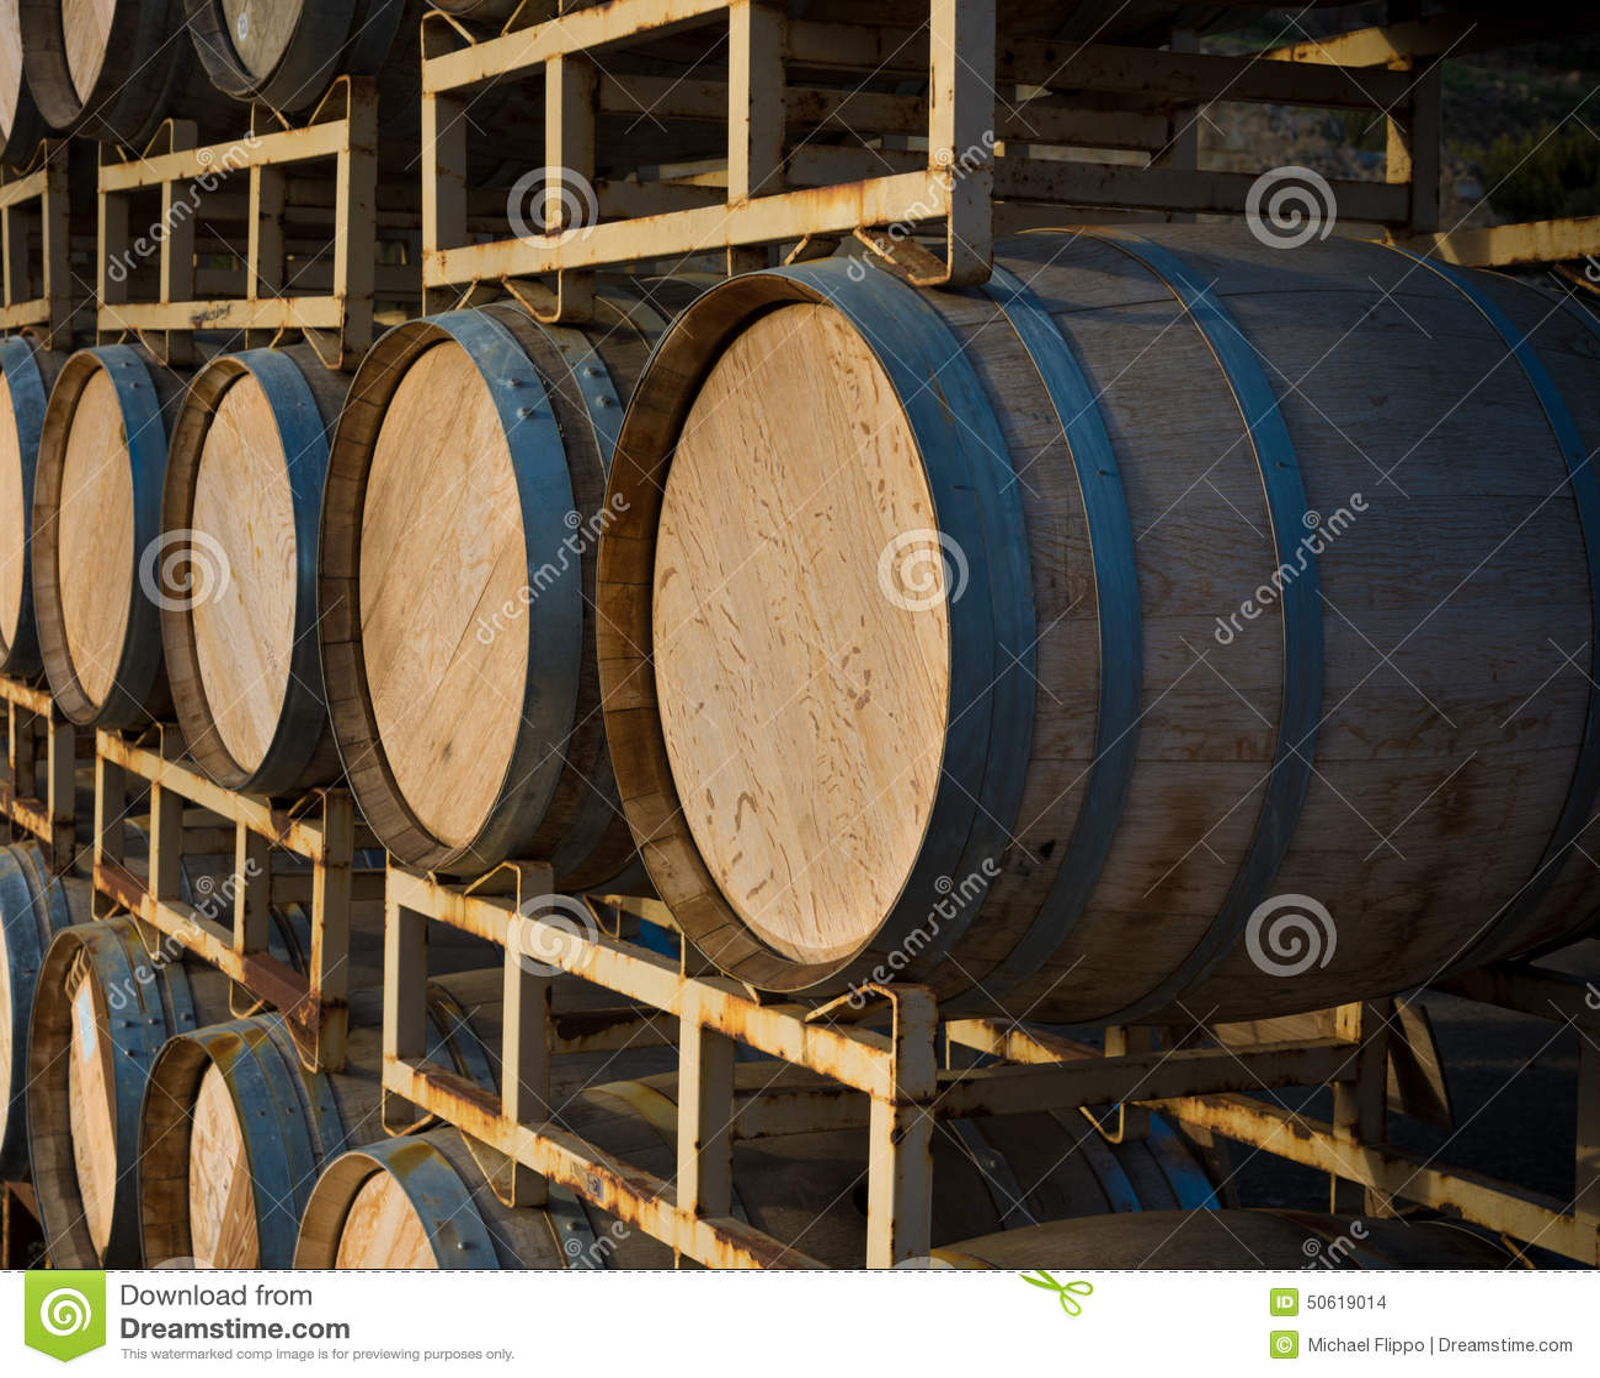 stack wine barrels stack of wine barrels barrel office barrel middot